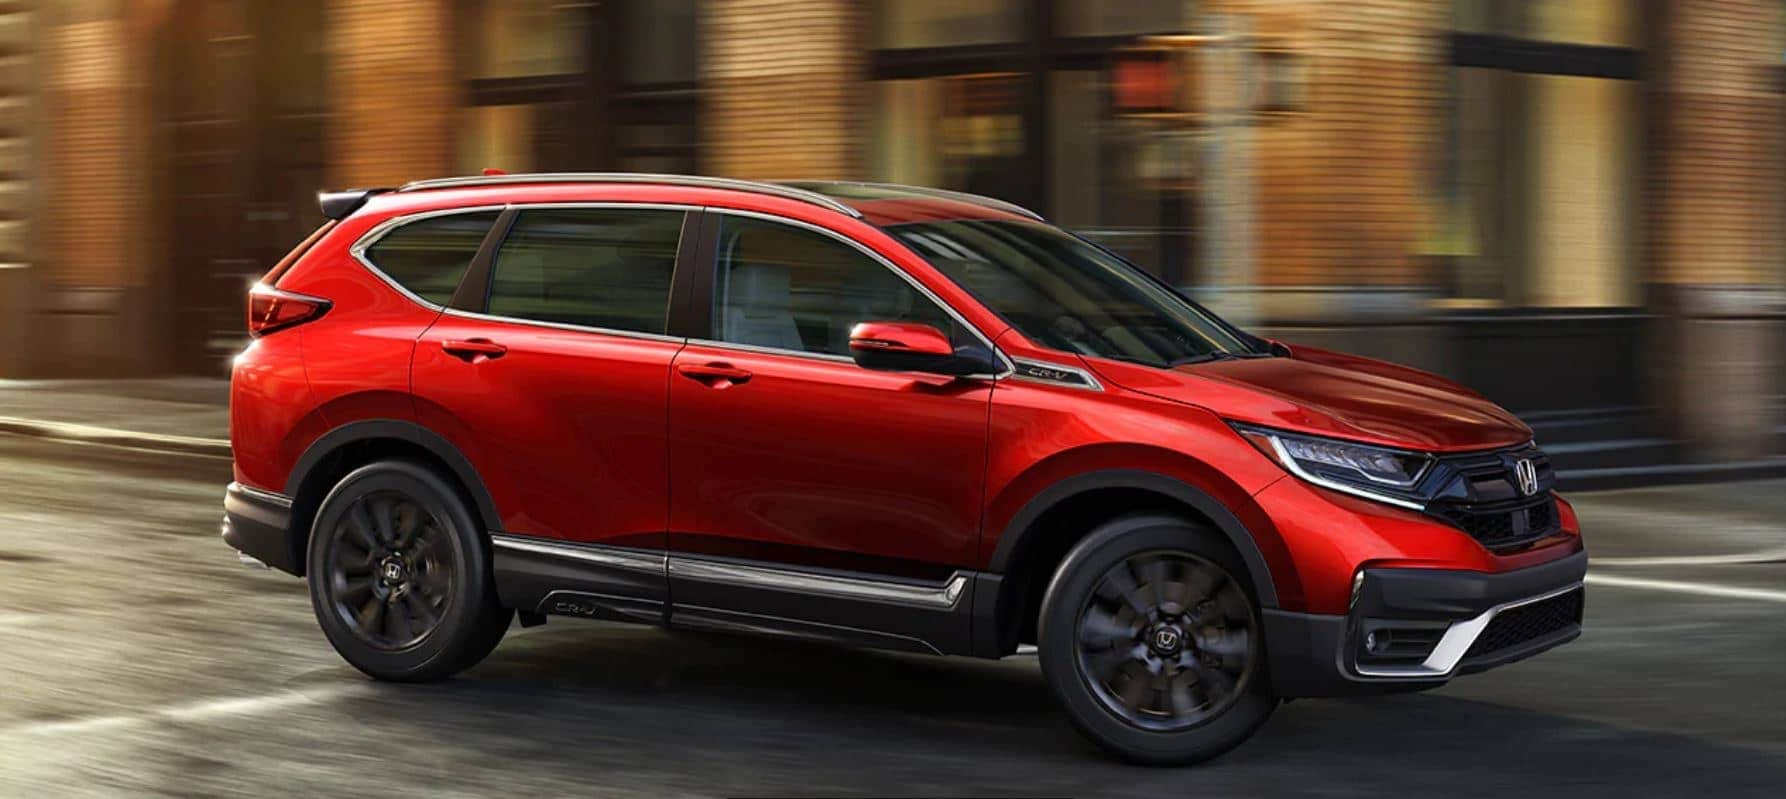 Buy a SUV Online 2020 Honda CR-V Near Greenwood Village CO